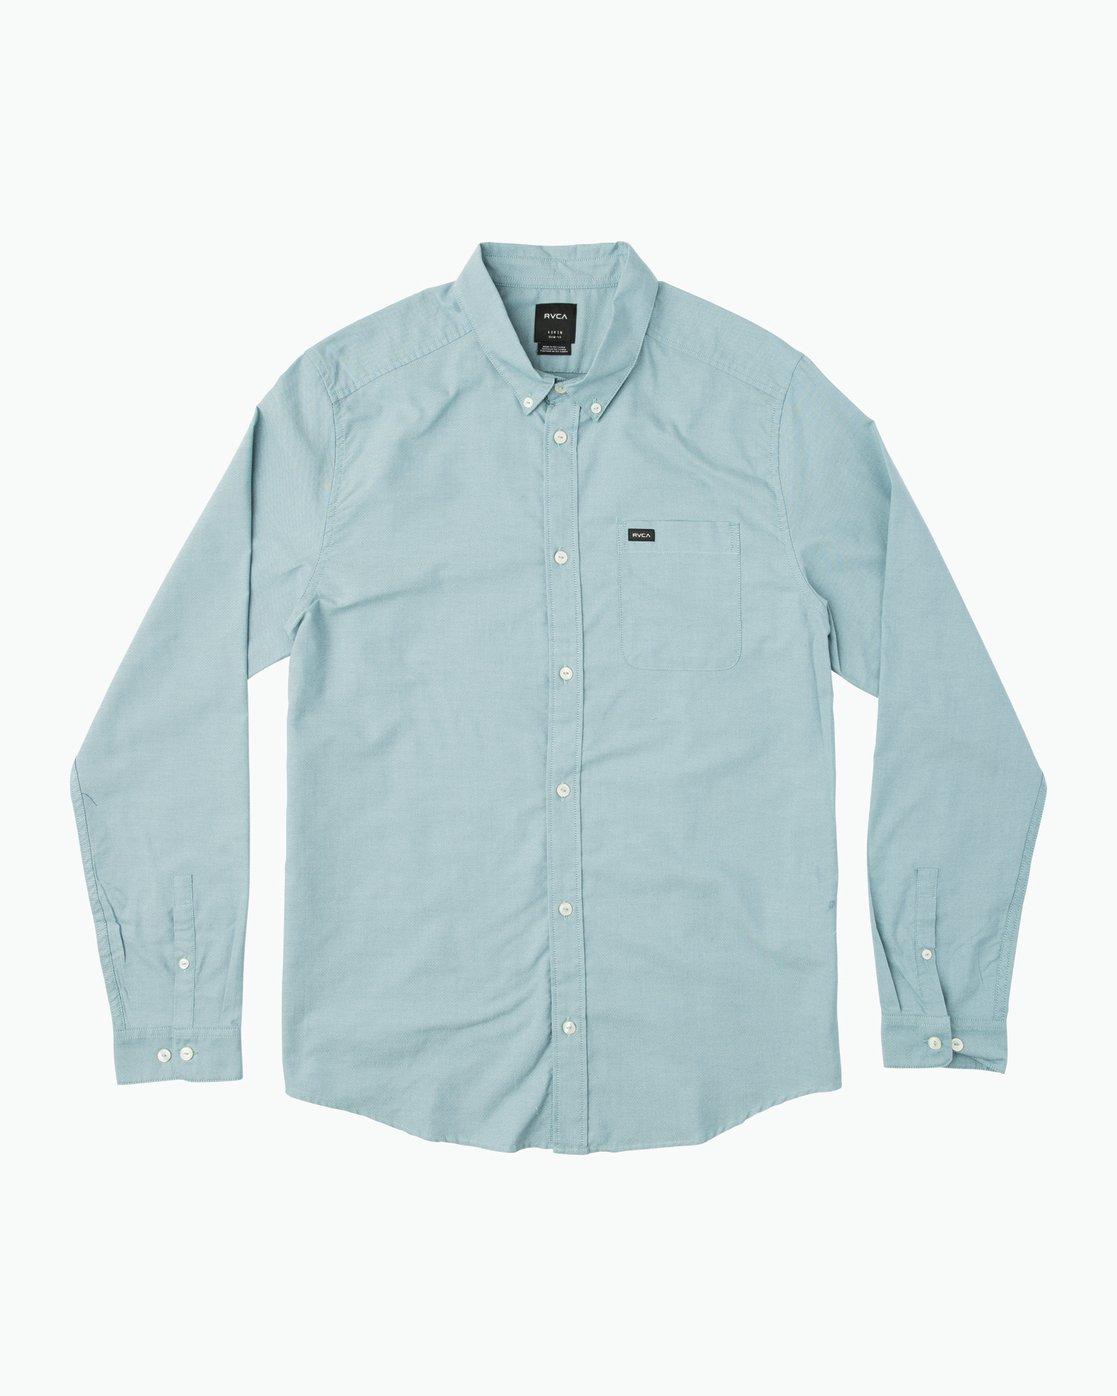 0 That'll Do Oxford Long Sleeve Shirt Blue M3515TDL RVCA